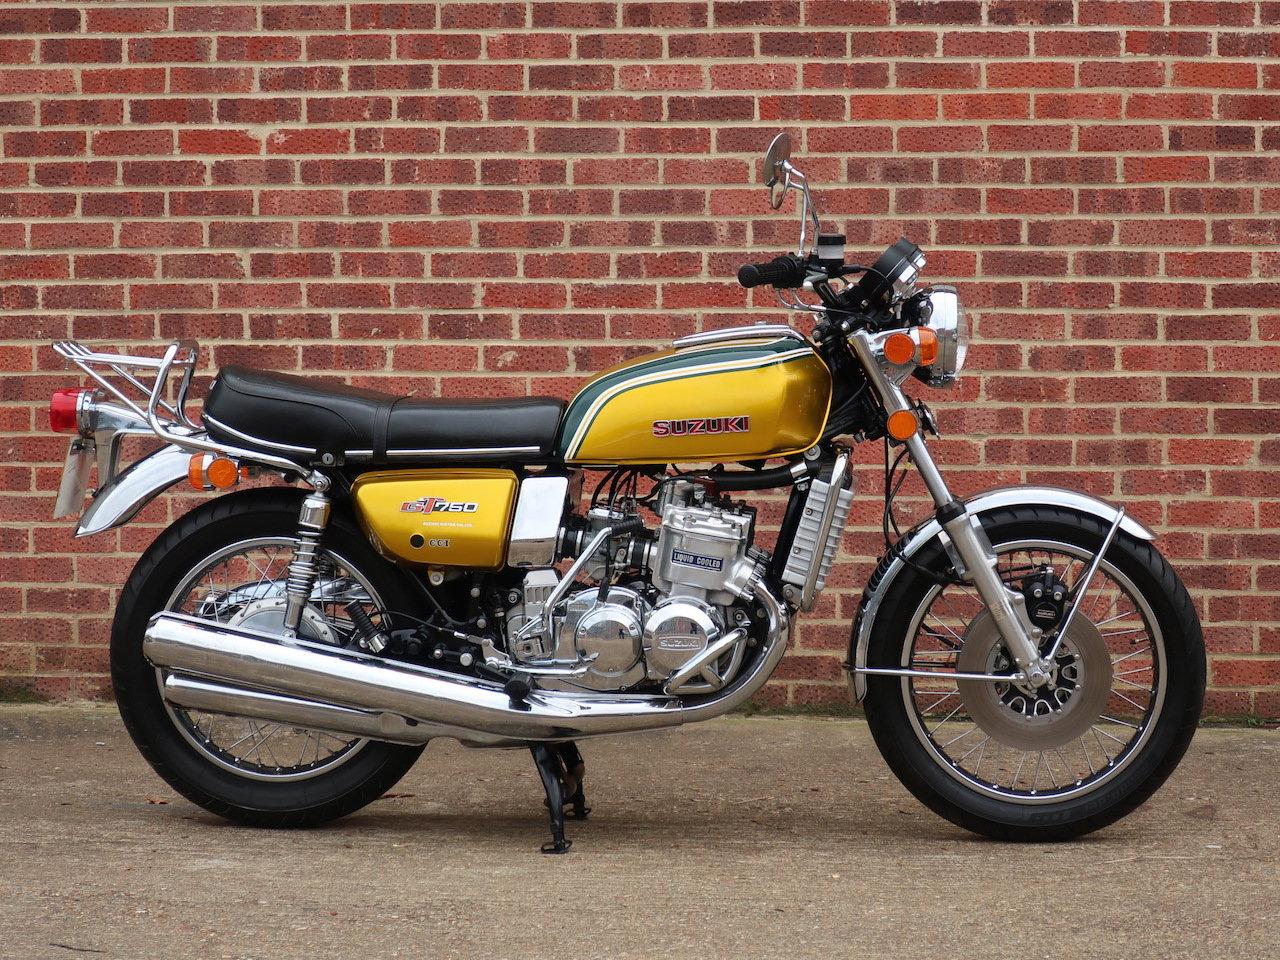 1976 Suzuki GT750 For Sale (picture 1 of 6)